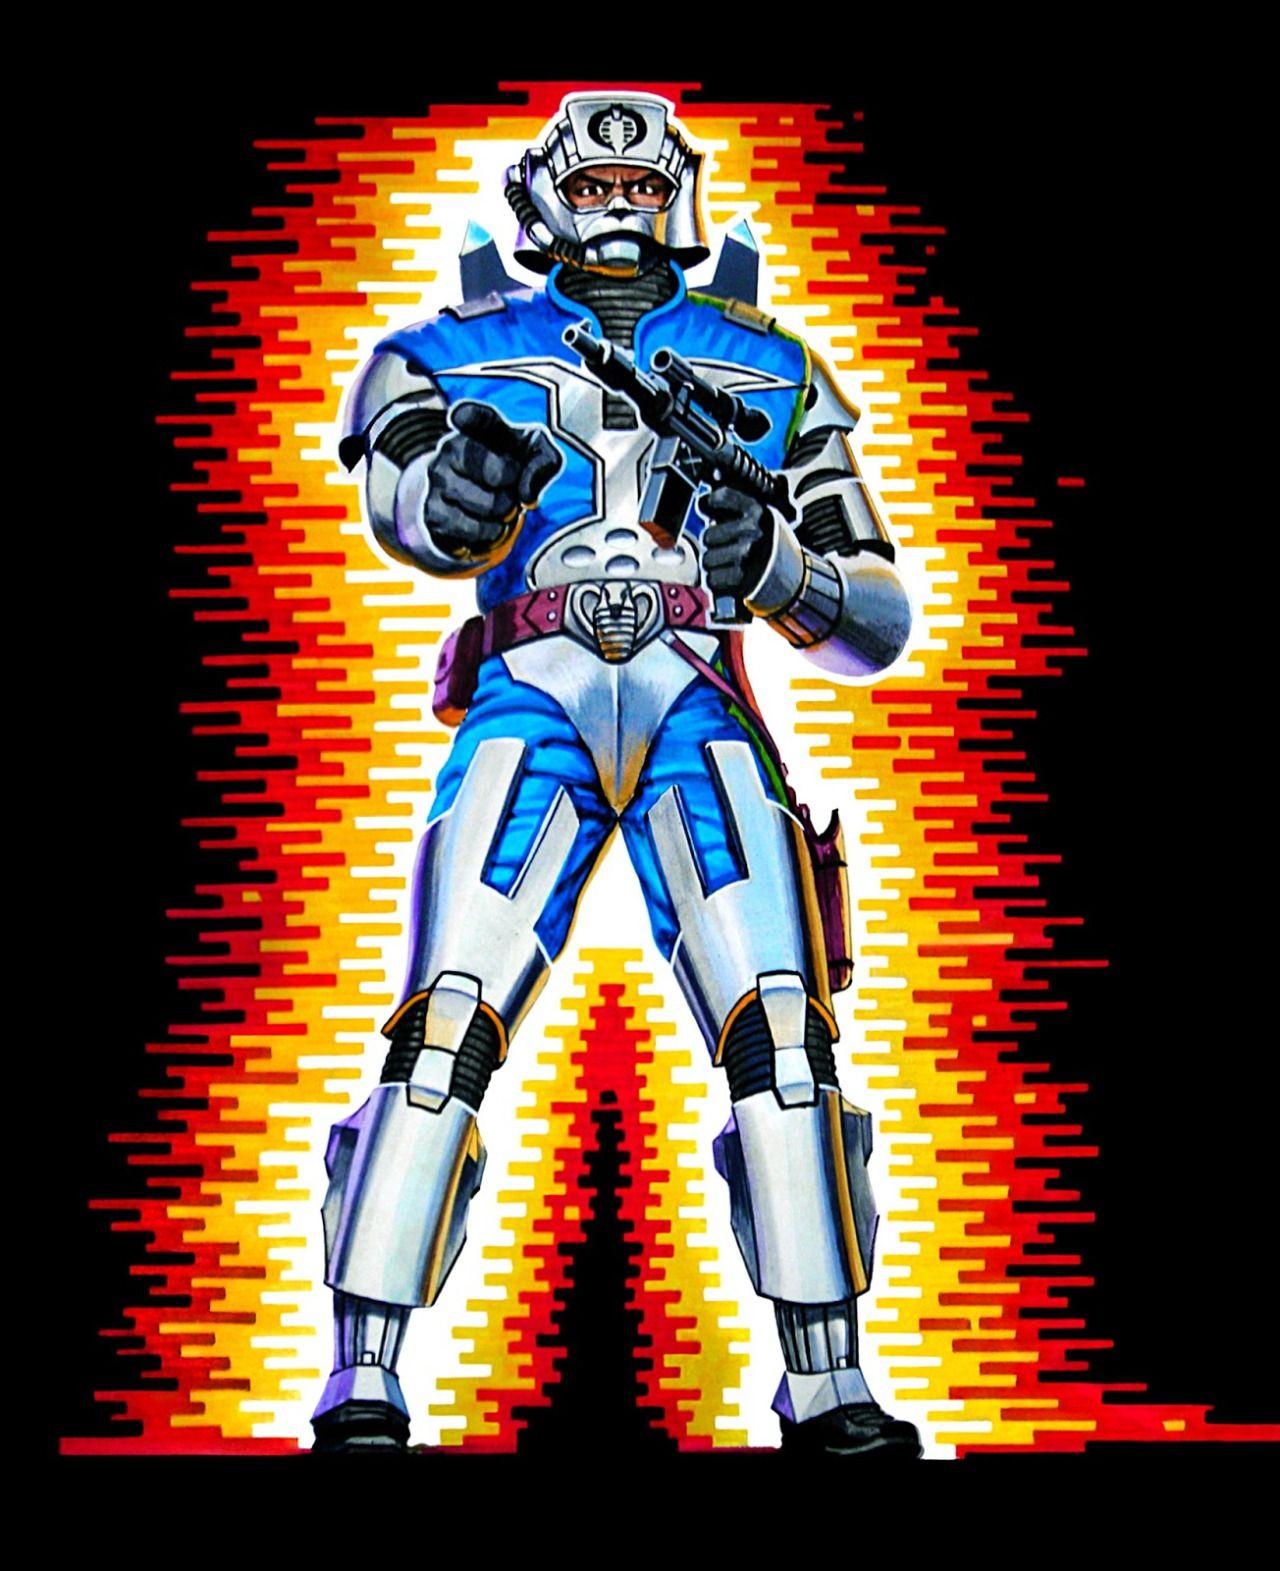 Battle Armor Cobra Commander Packaging Artwork - Hector Garrido